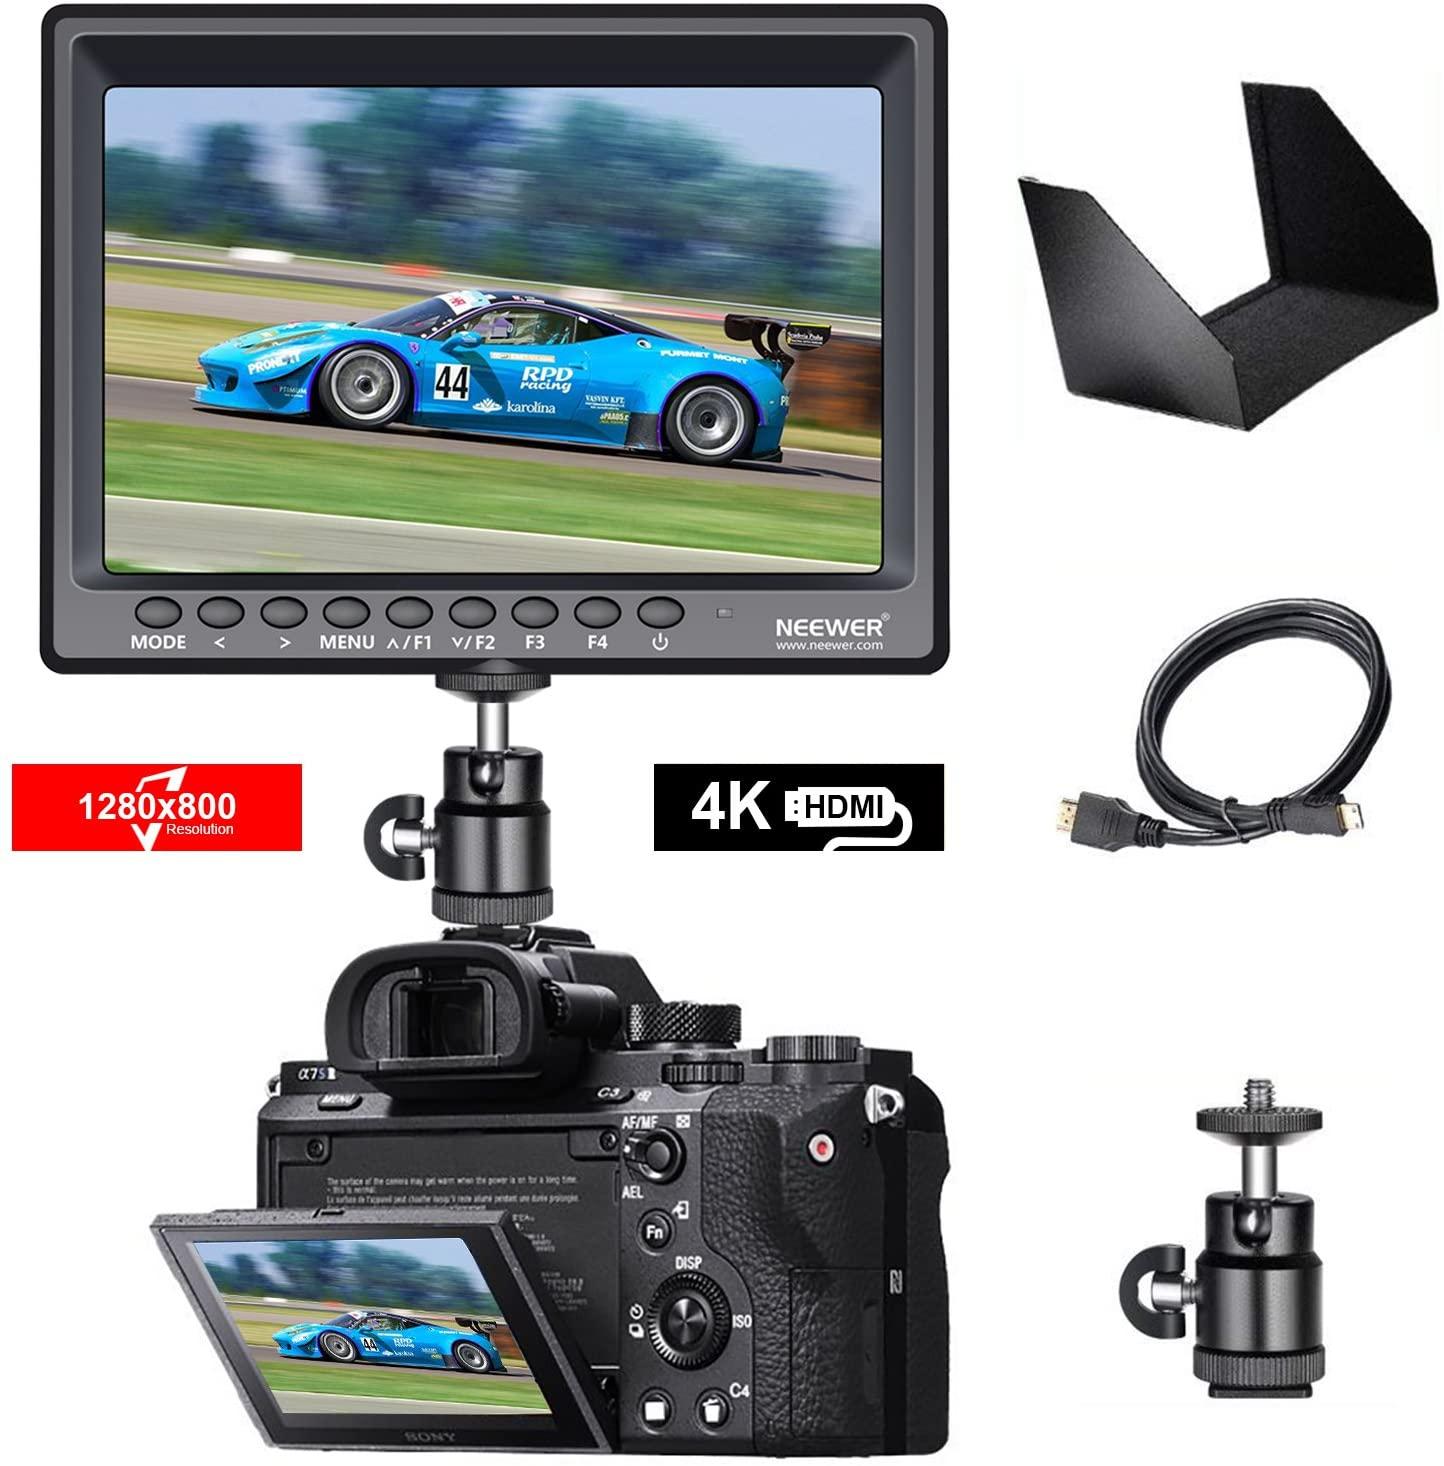 Neewer F100 7インチ 1280x800 IPSスクリーンカメラフィールドモニター 4K入力 BMPCC用ミニHDMIケーブル、FPV用AVケーブル付 16:10 4:3調整可能な表示比率(